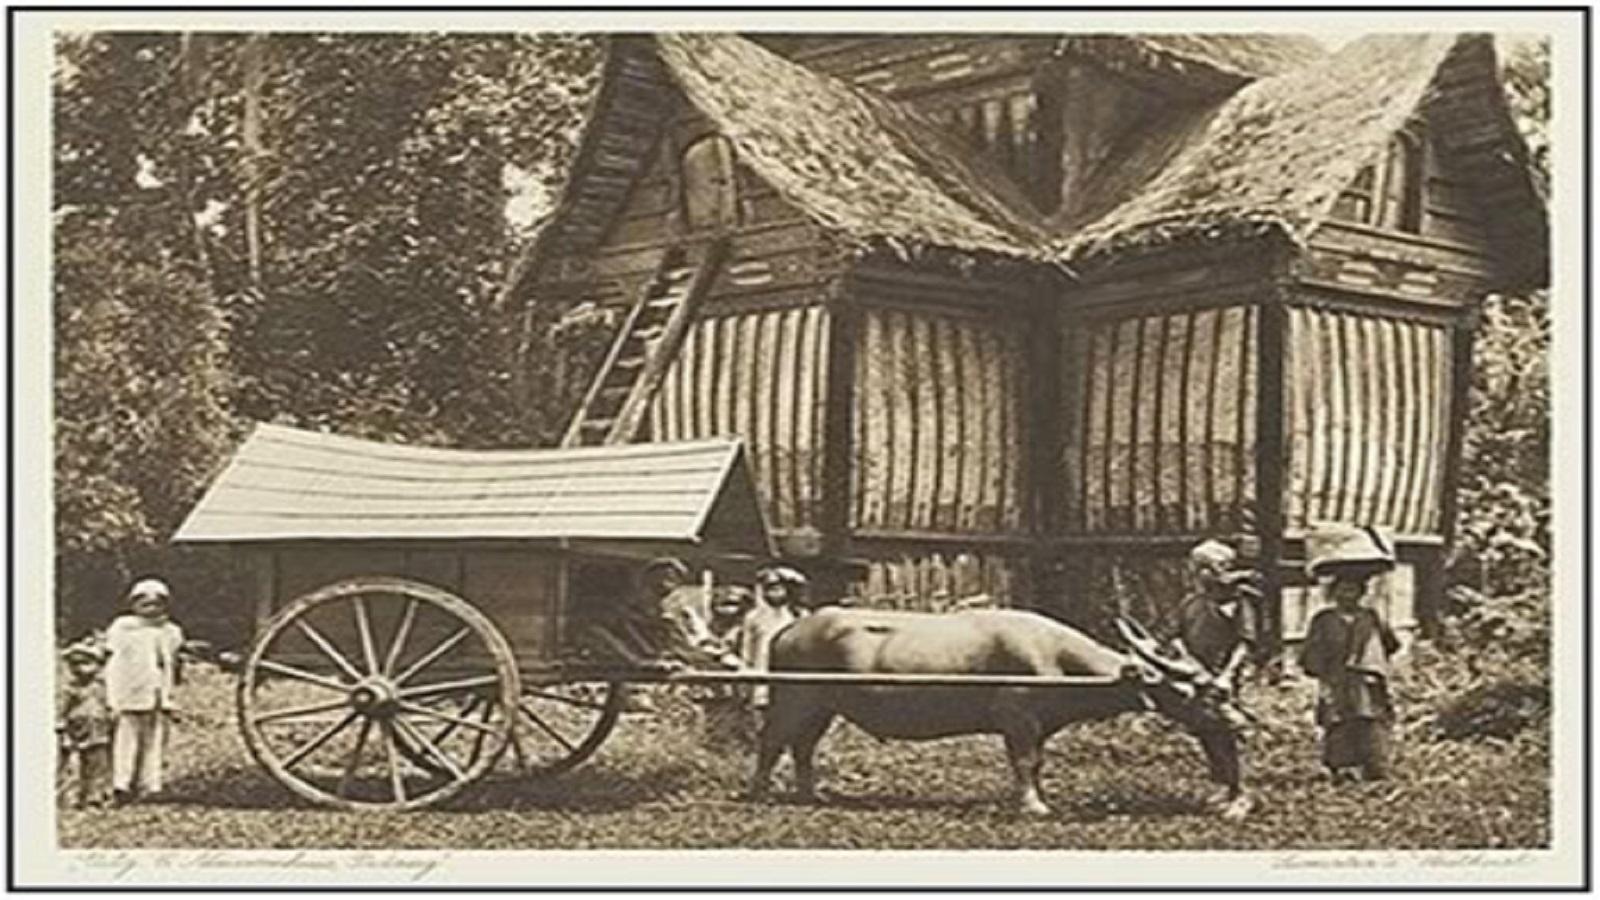 Penduduk Bumi Putra, Dan Terbentuknya Nagari Padang Salapan Suku : Bagian Keenam Dari Tulisan Kota Padang Dalam Tinjauan Tradisi